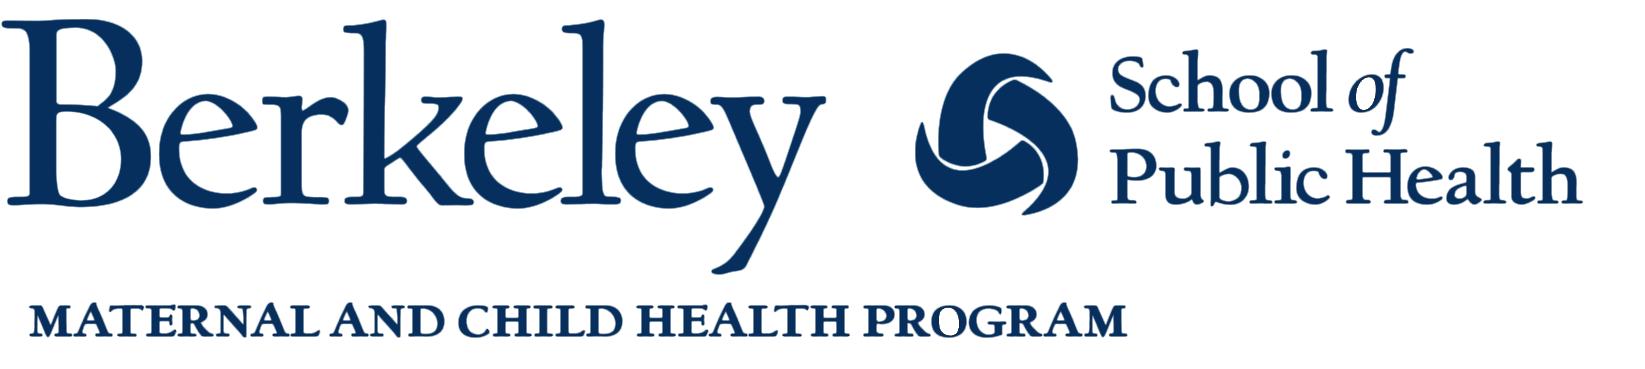 uc berkeley maternal and child health at school of public health logo